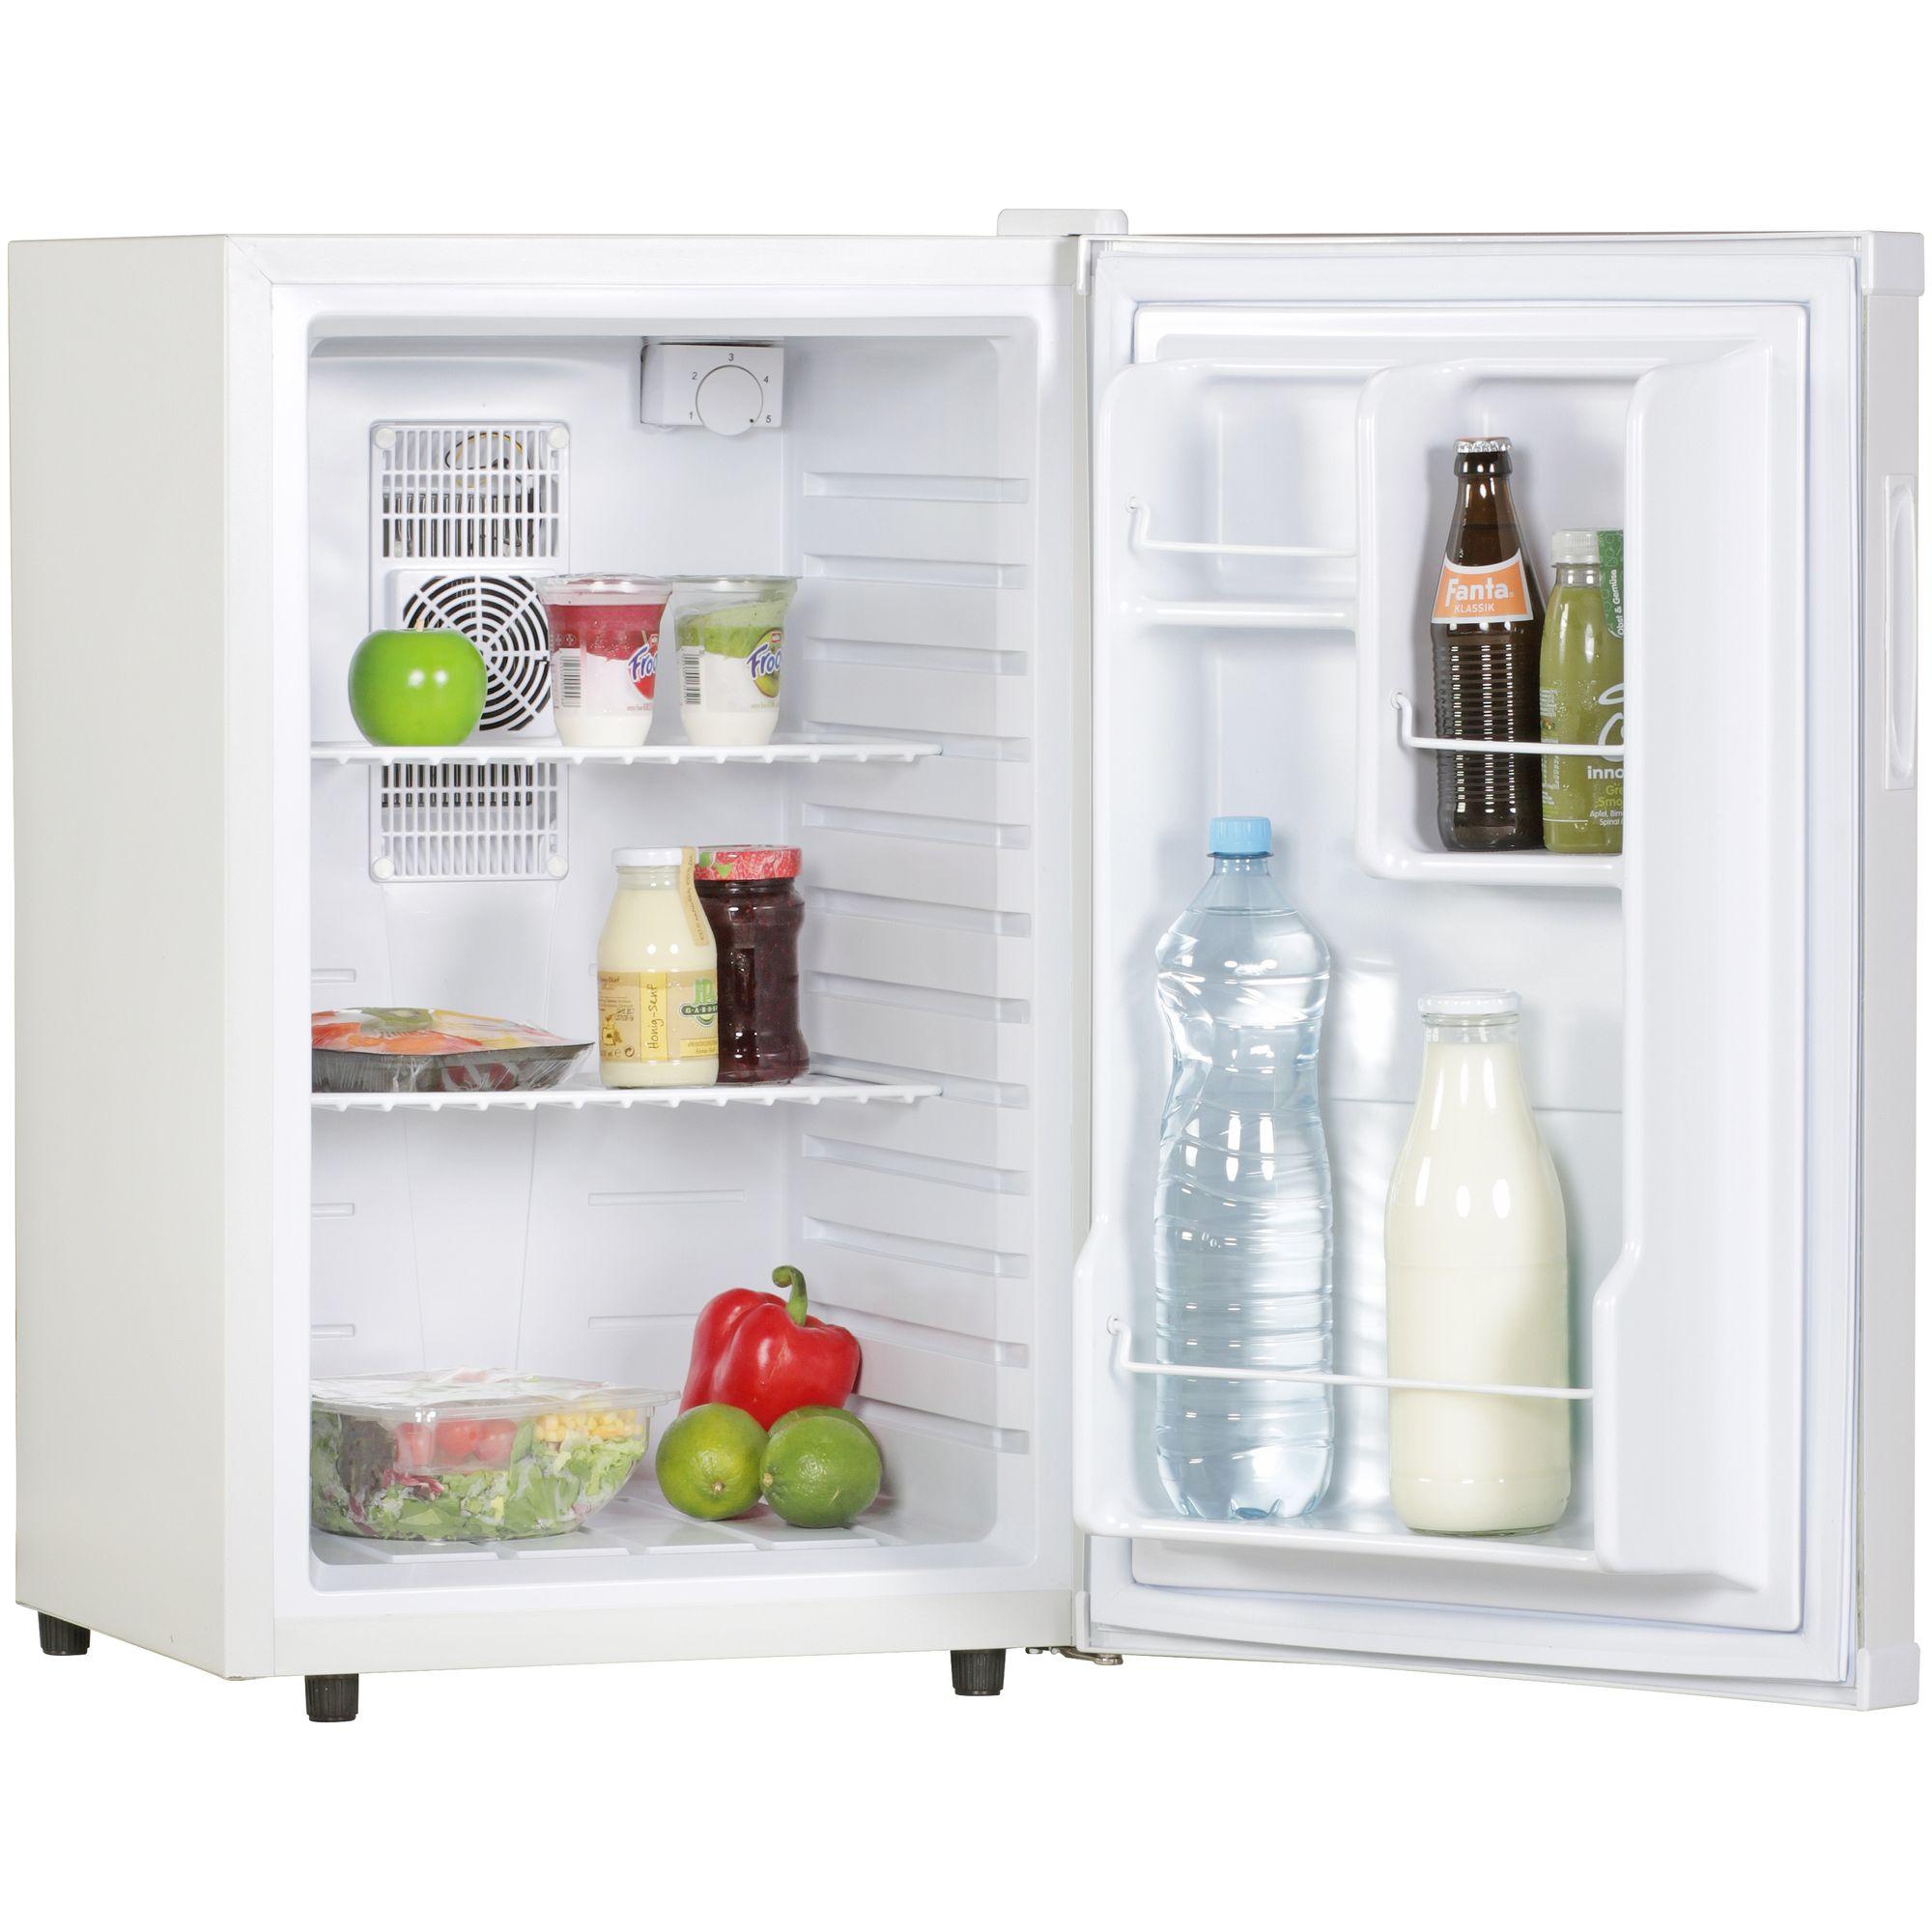 AMSTYLE Mini Kühlschrank 65 Liter / Minibar weiß ...